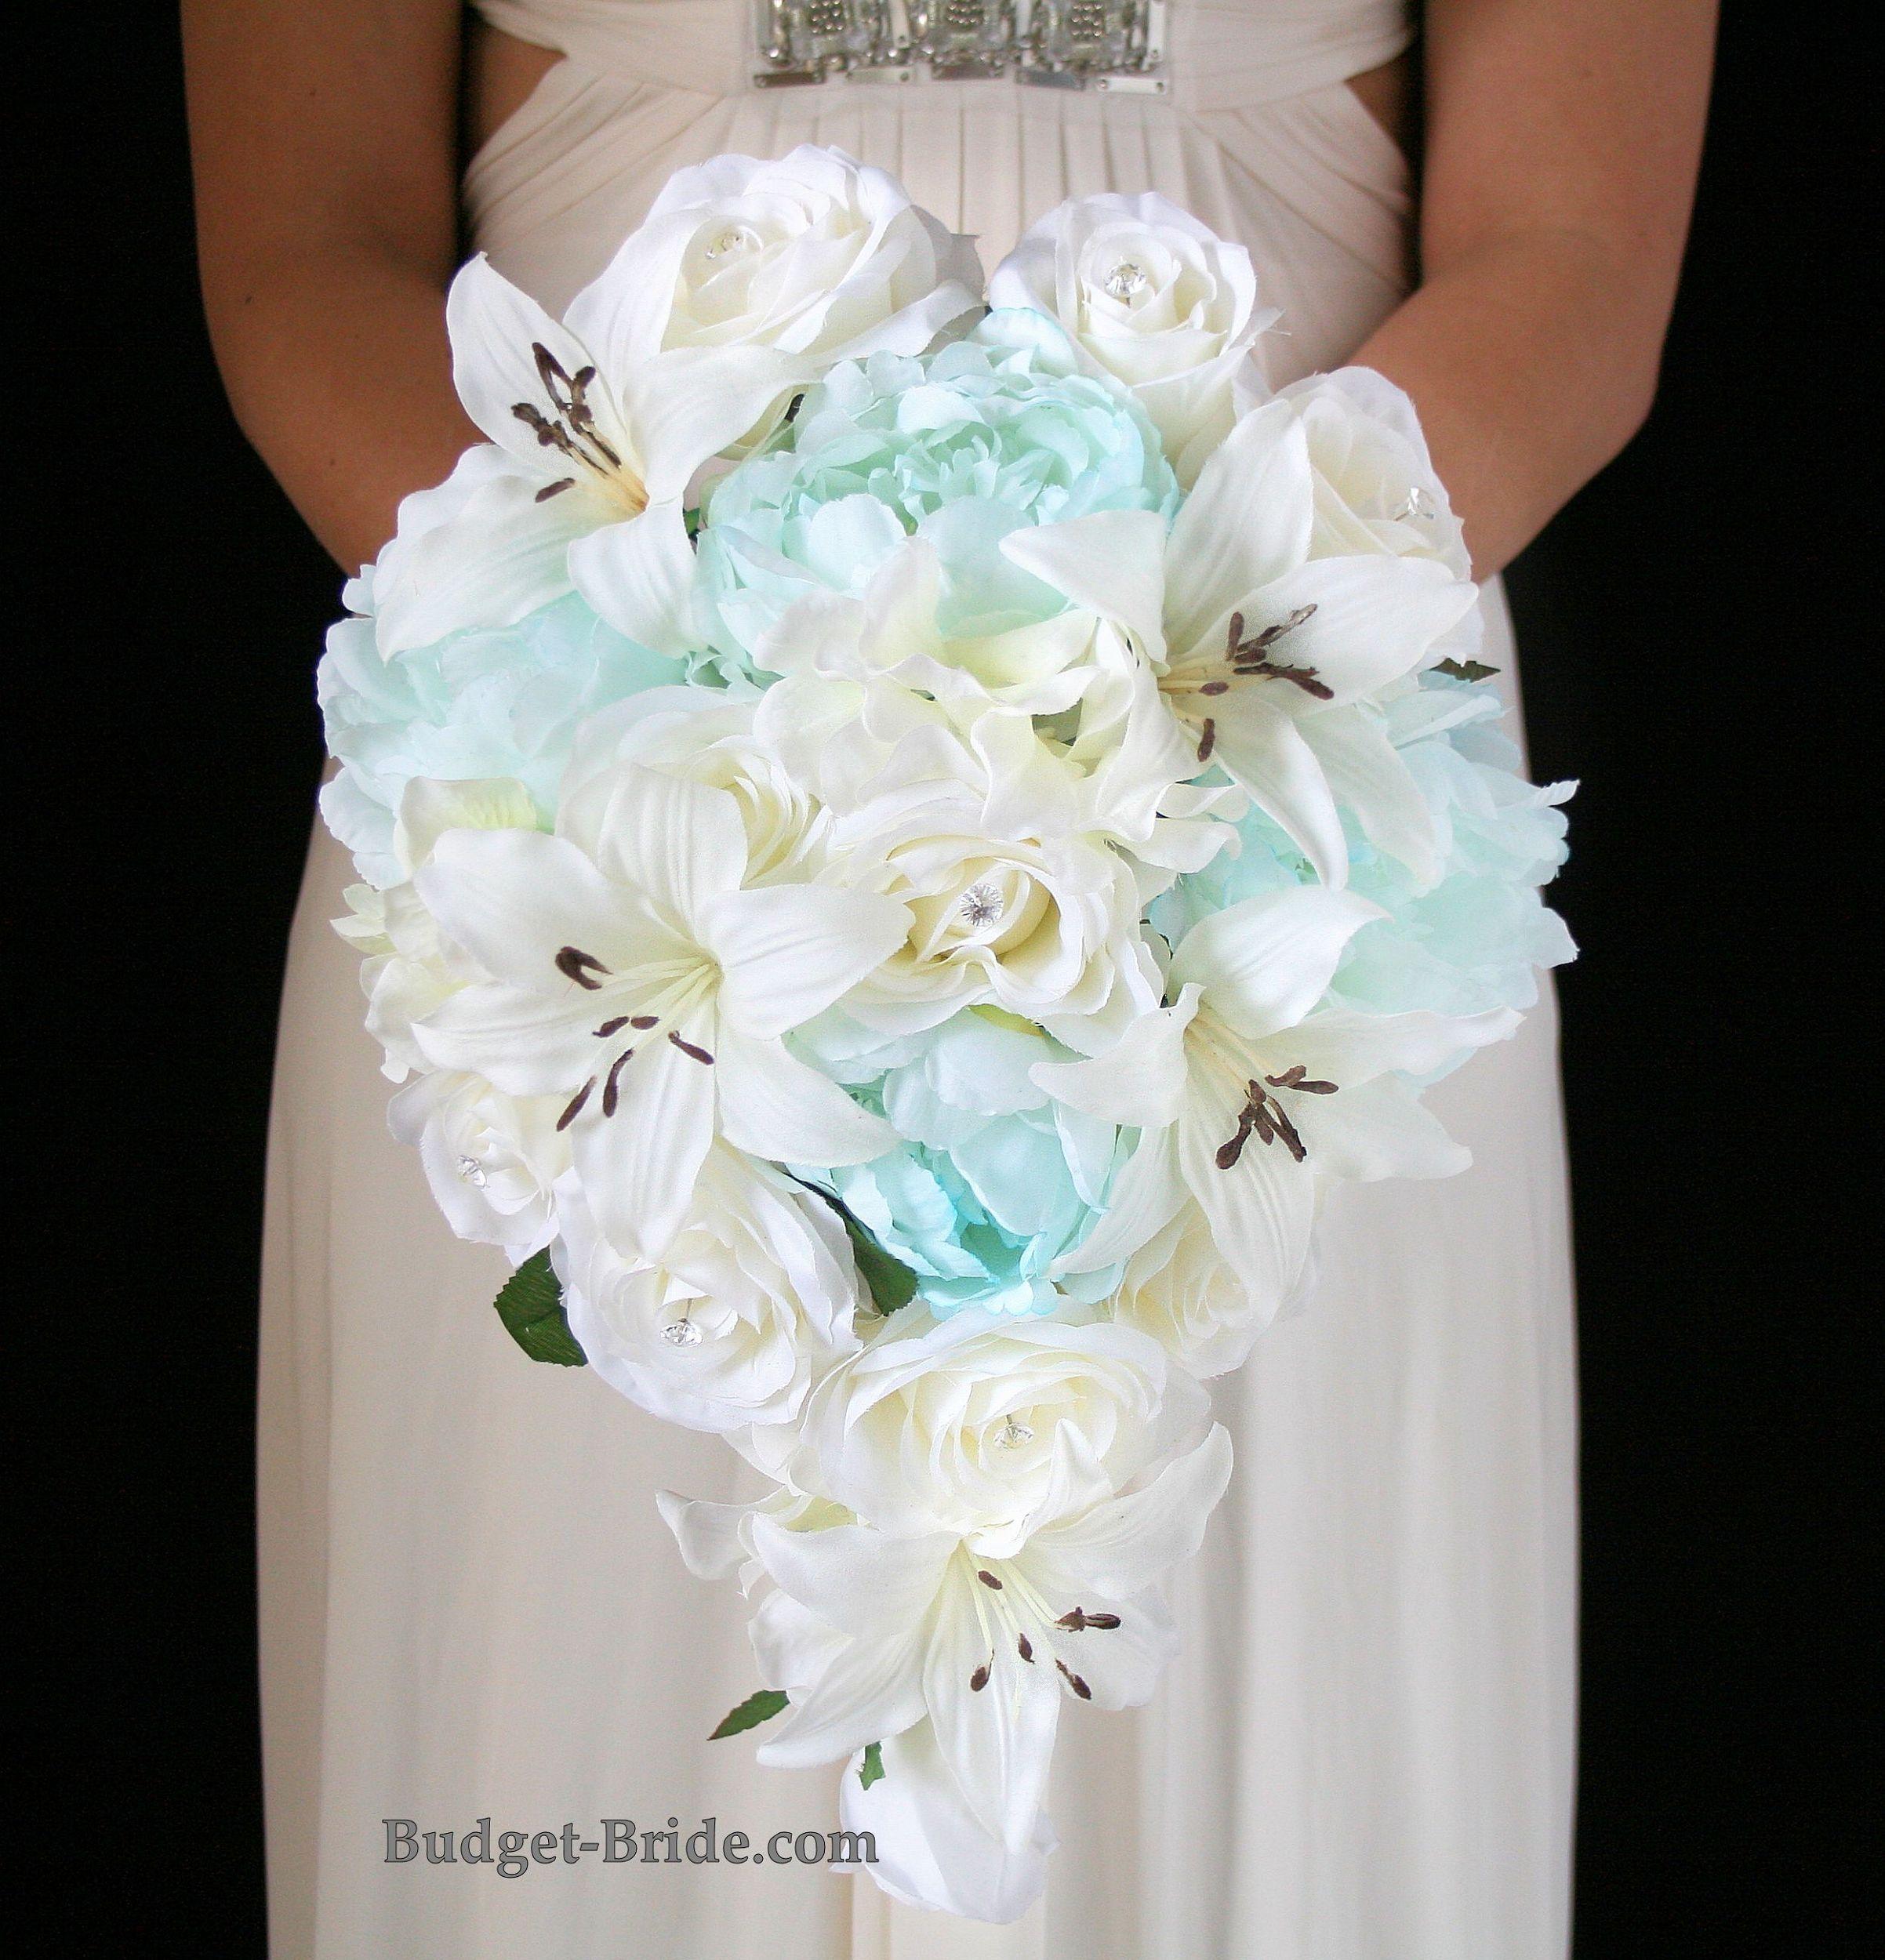 Bouquet Sposa Tiffany.Cascading Tiffany Blue And White Wedding Bouquet With Tiffany Blue